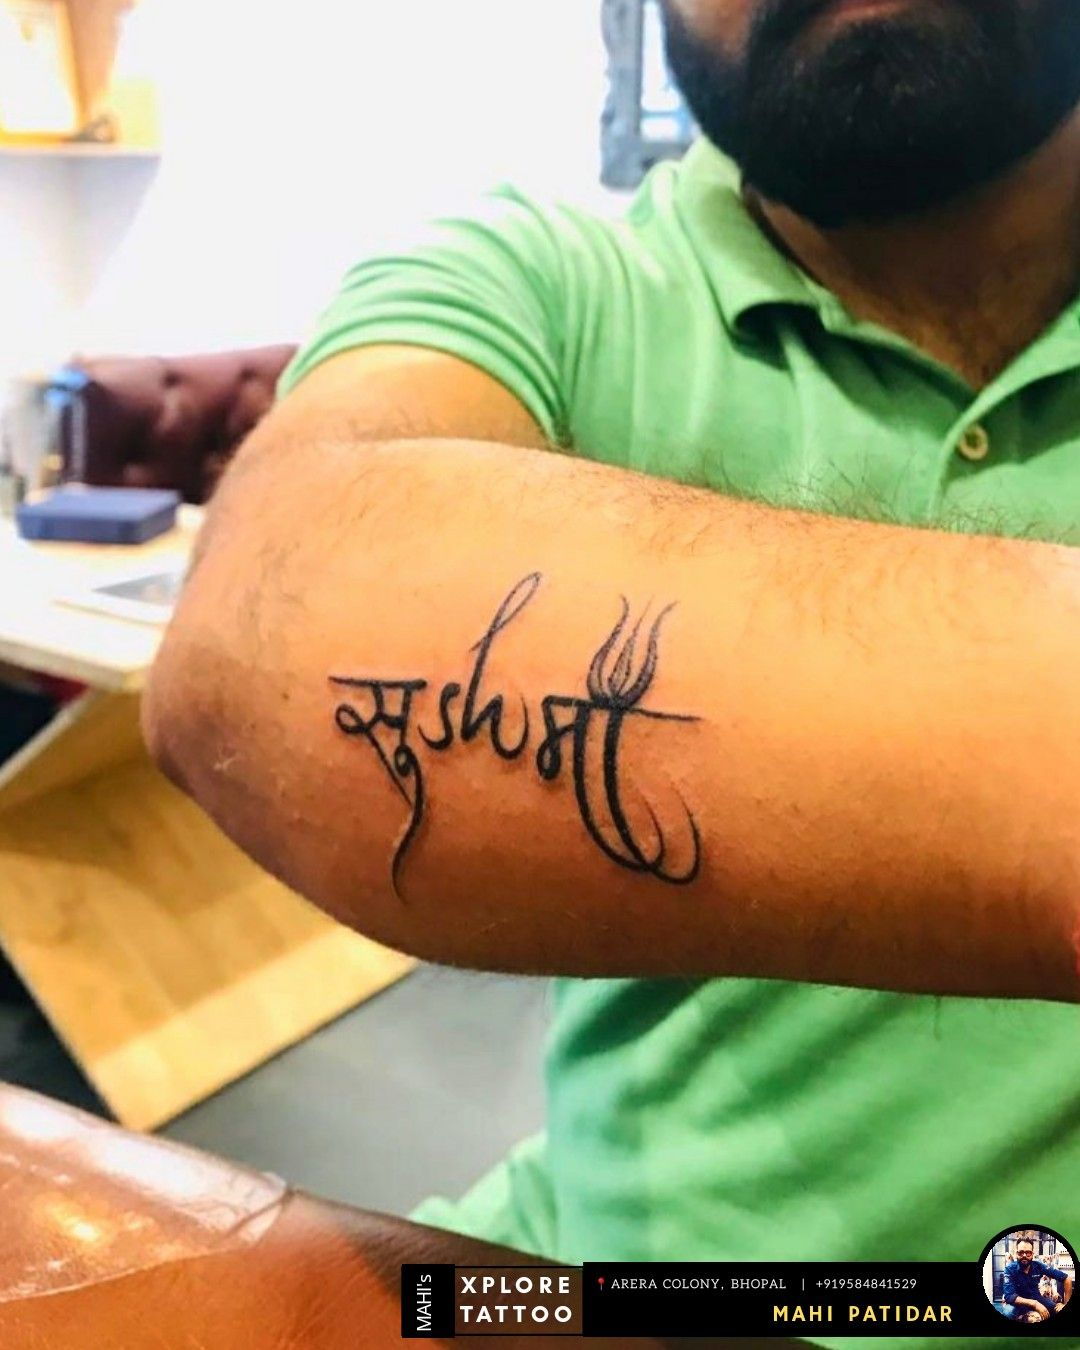 Full Hand Sleev Freehand Name Tattoo By Mahi Patidar Xplore Tattoo Studio Bhopal 919584841529 In 2020 Name Tattoo Designs Tattoo Studio Tattoos